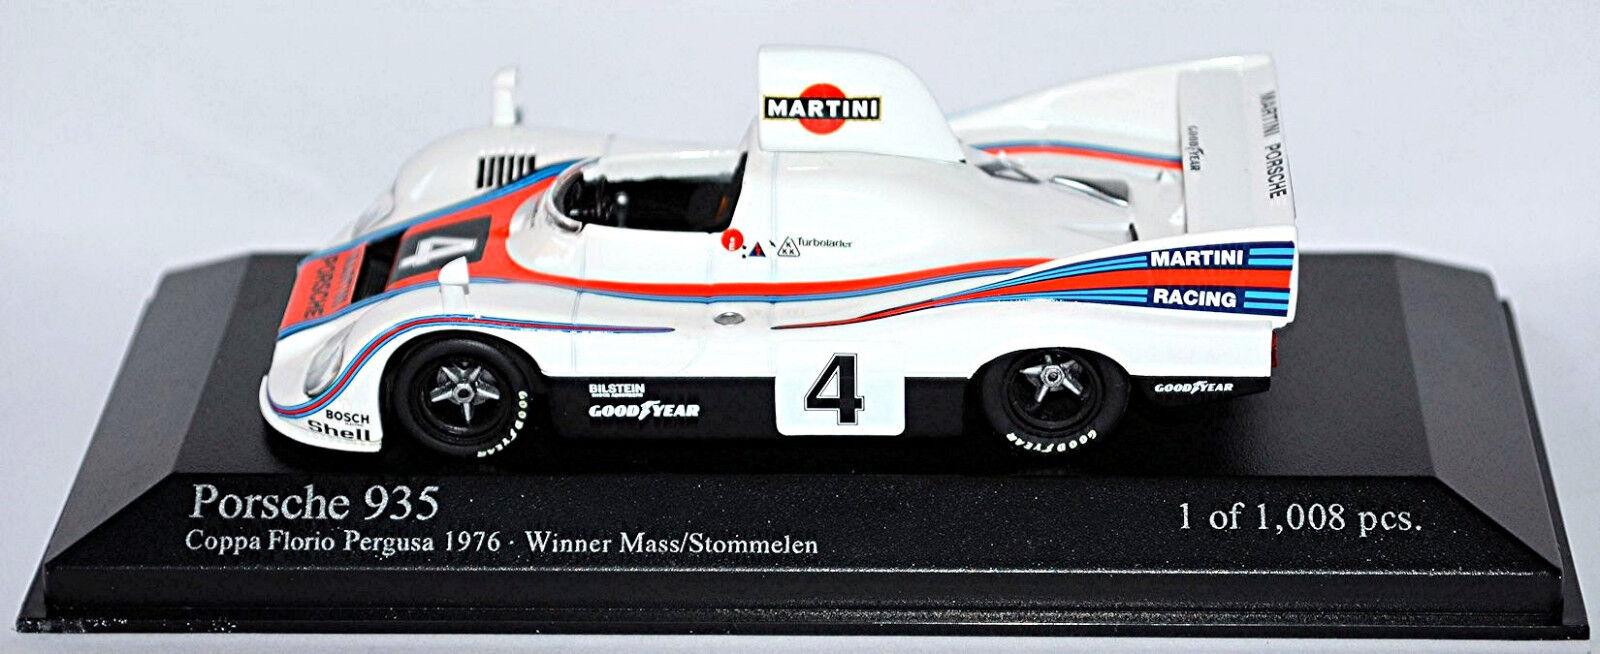 Porsche 936 76 Martini Winner Winner Winner Copa Florio 1976 Dimensions Stoomelen 1 43 a19b13